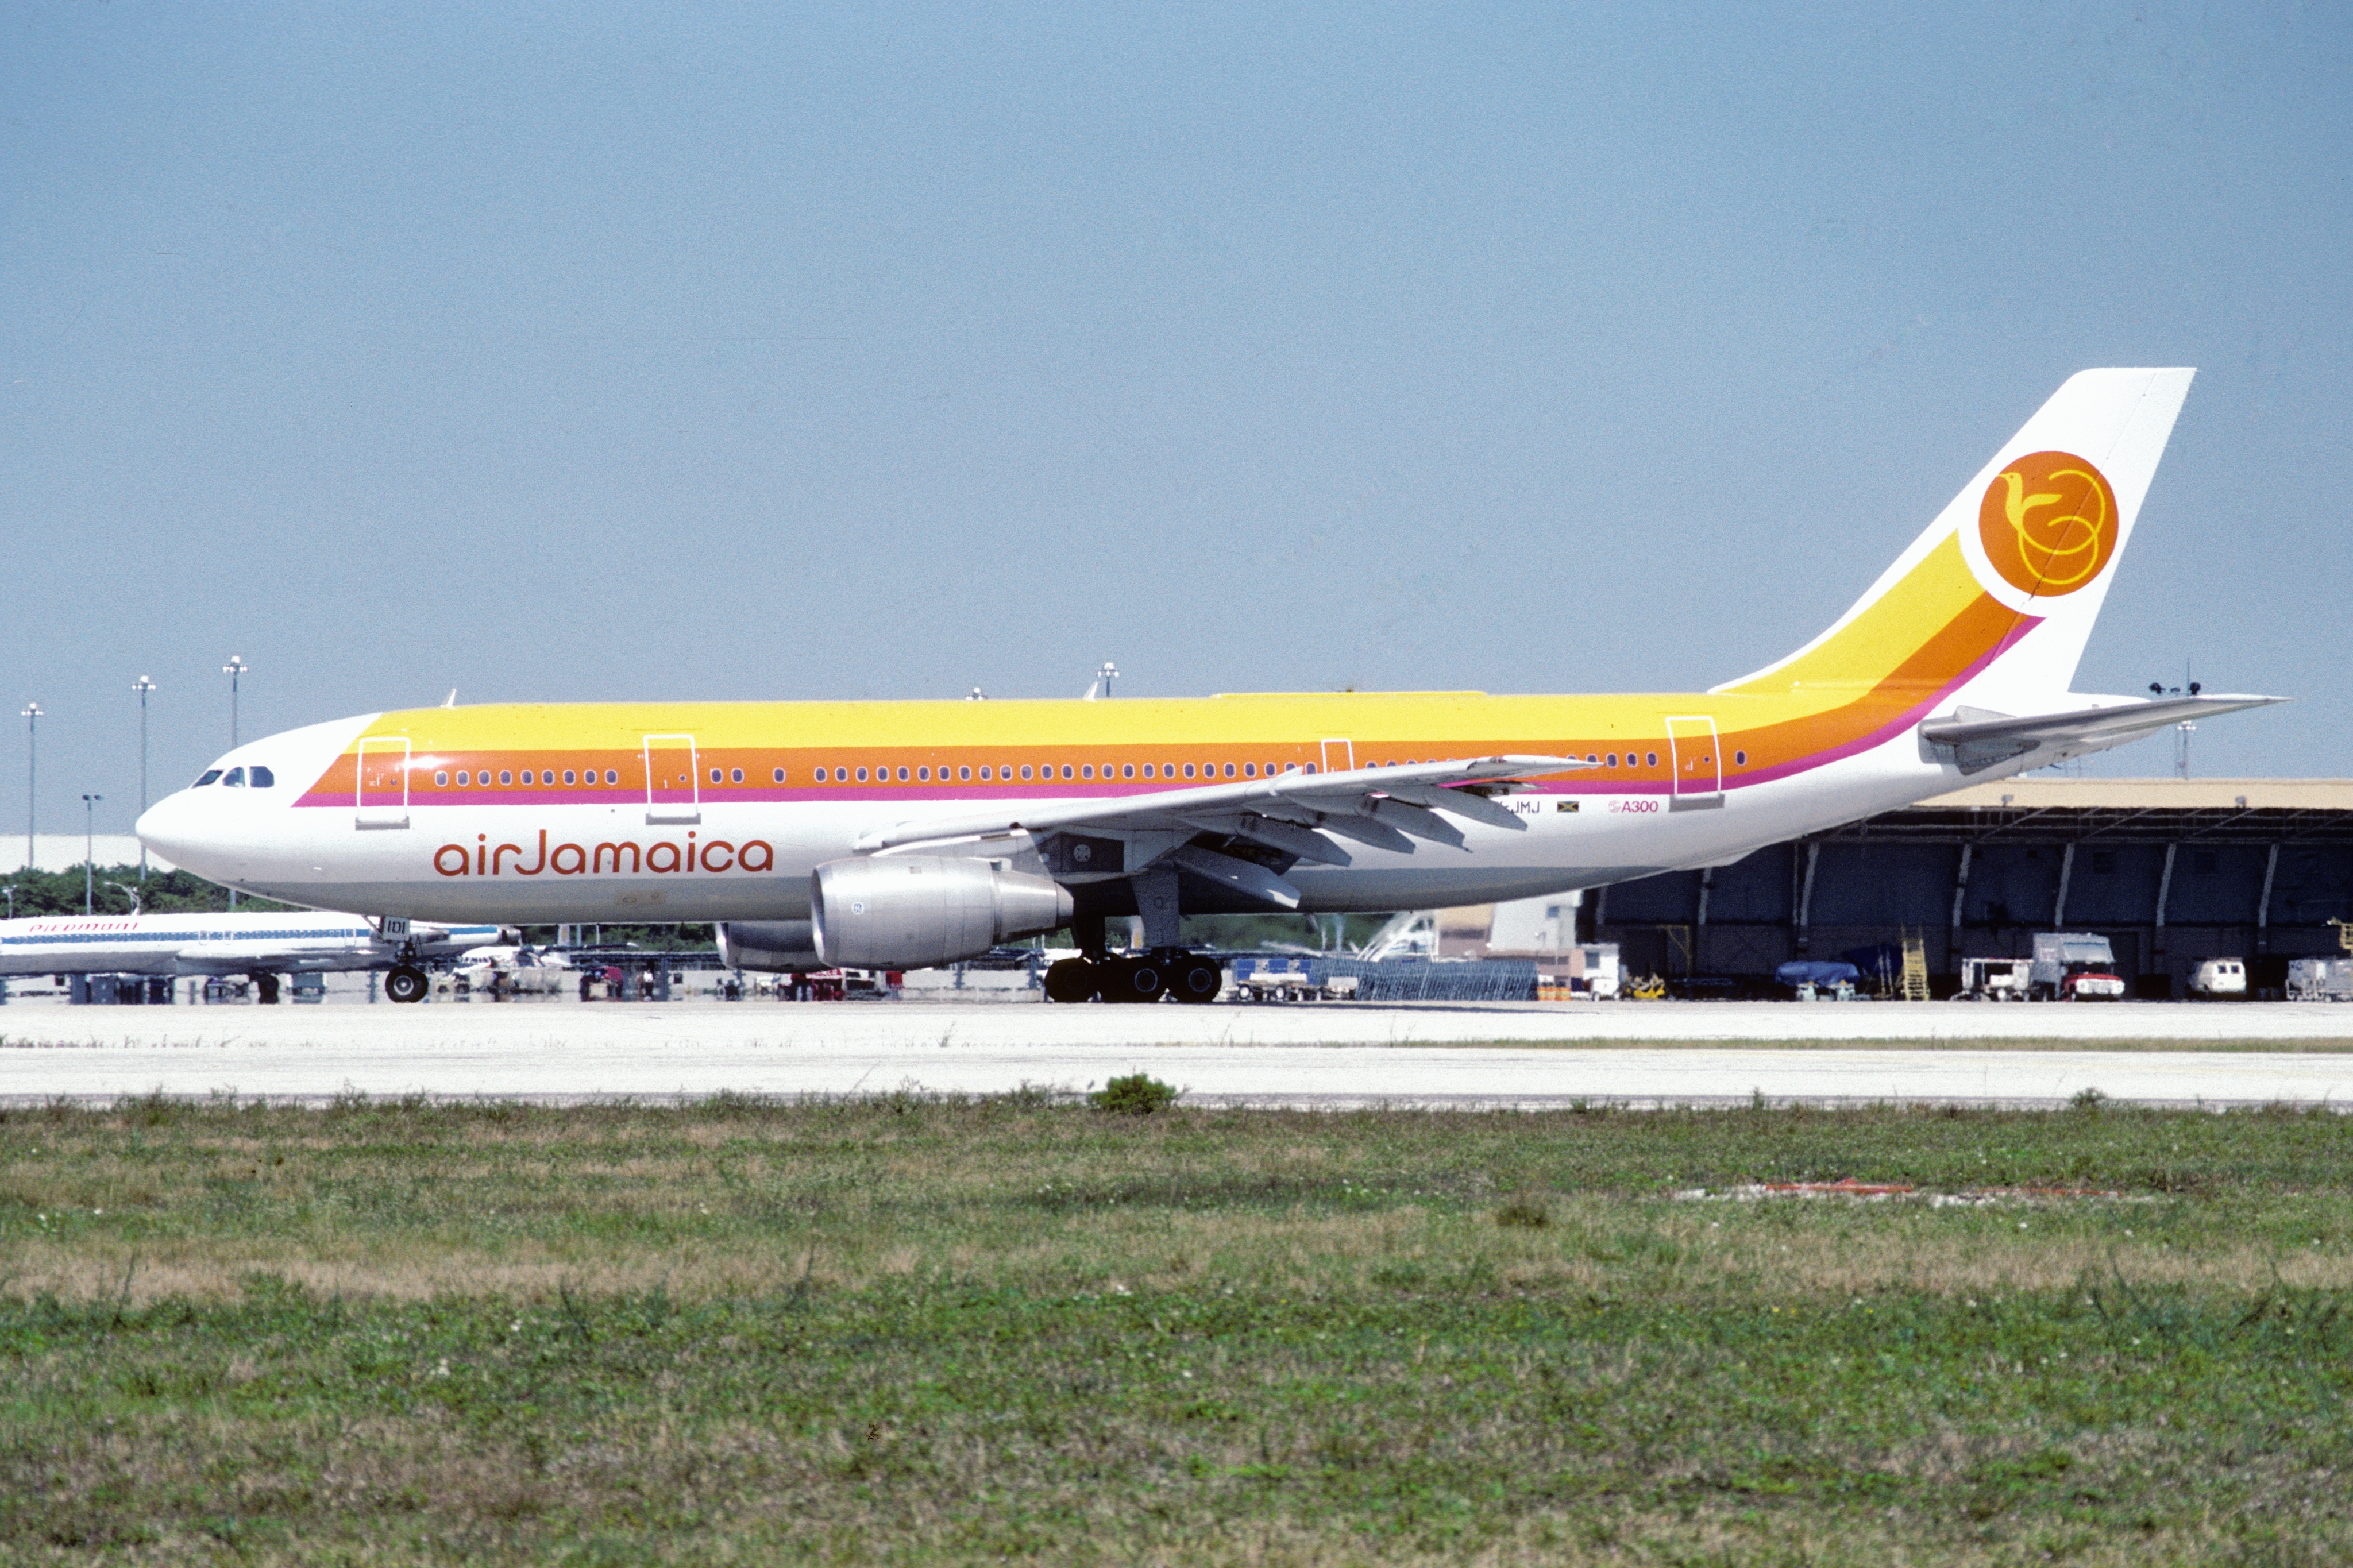 6y File:Air Jamaica Airbus A300B4-203 (6Y-JMJ 127) (10360267323